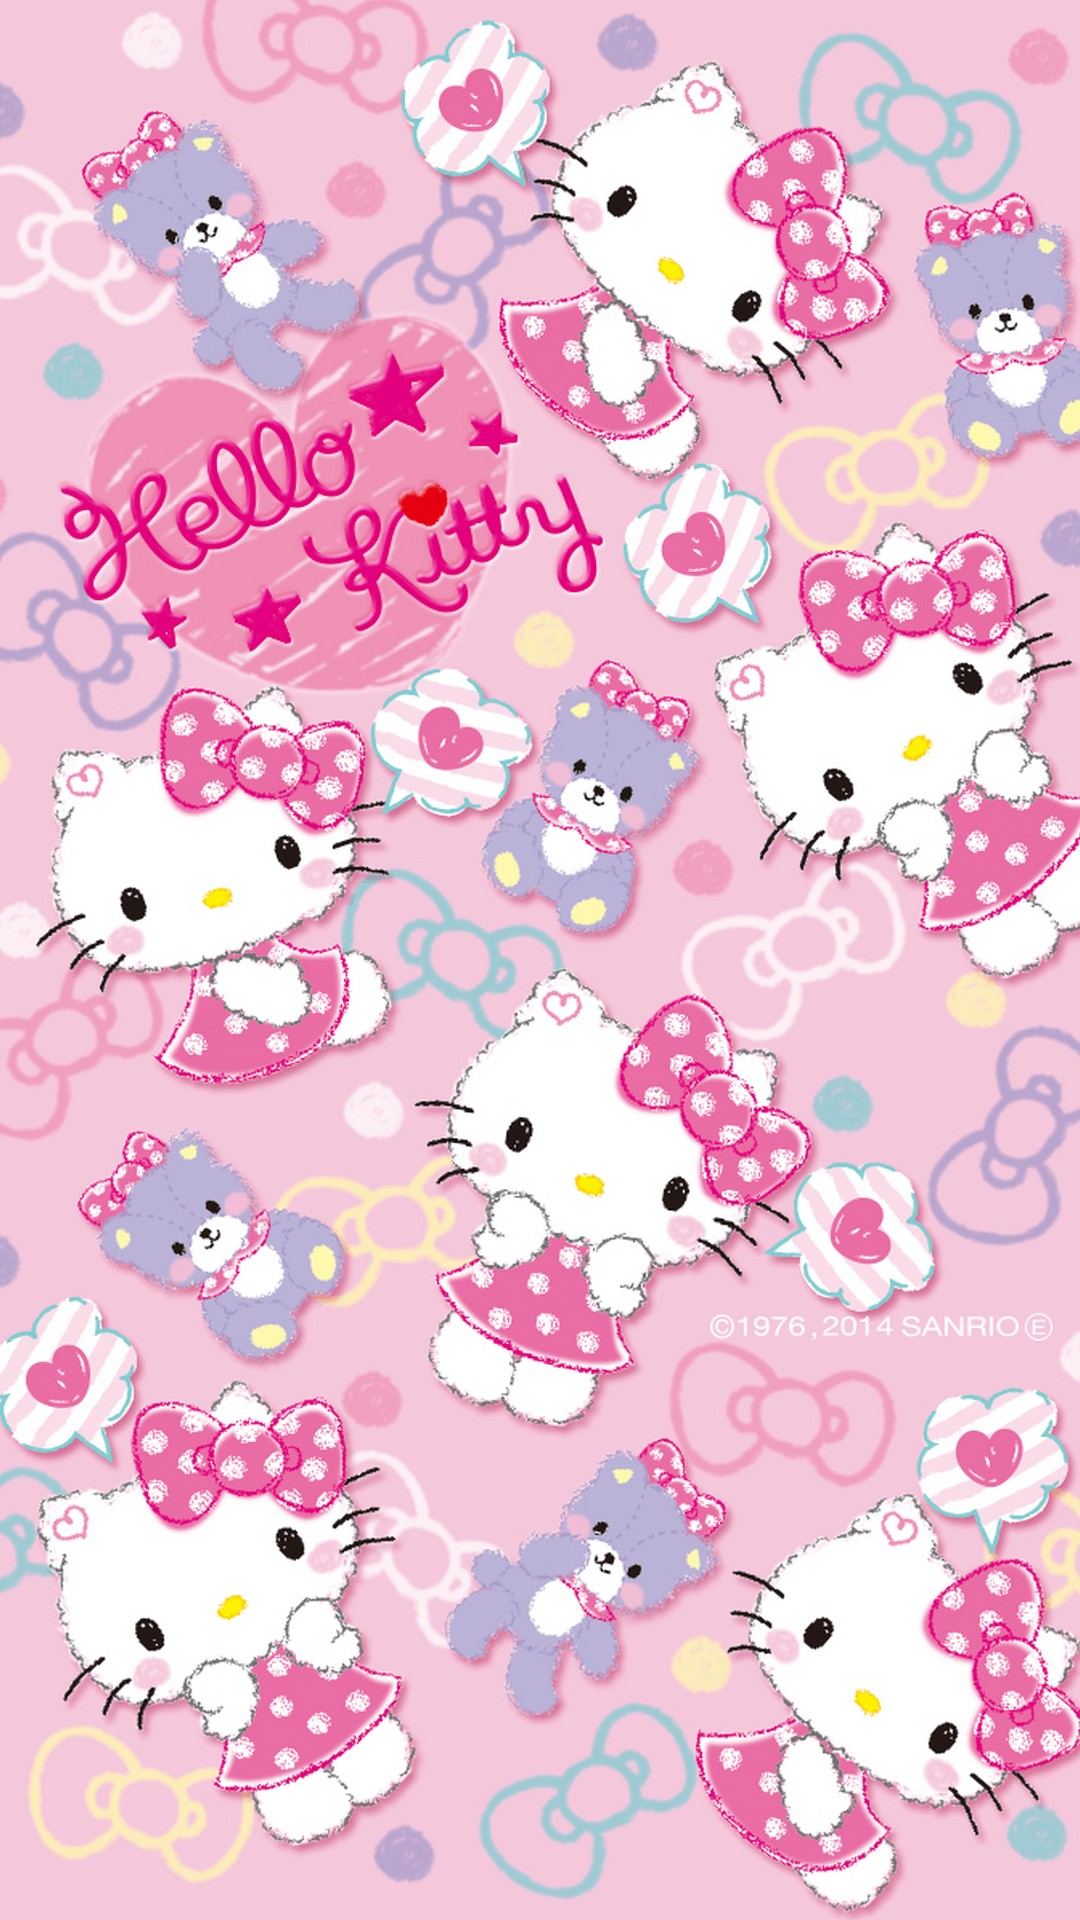 Hello Kitty Wallpaperby Artist Unknown   Hello Kitty Wallpaper Hd 1080x1920